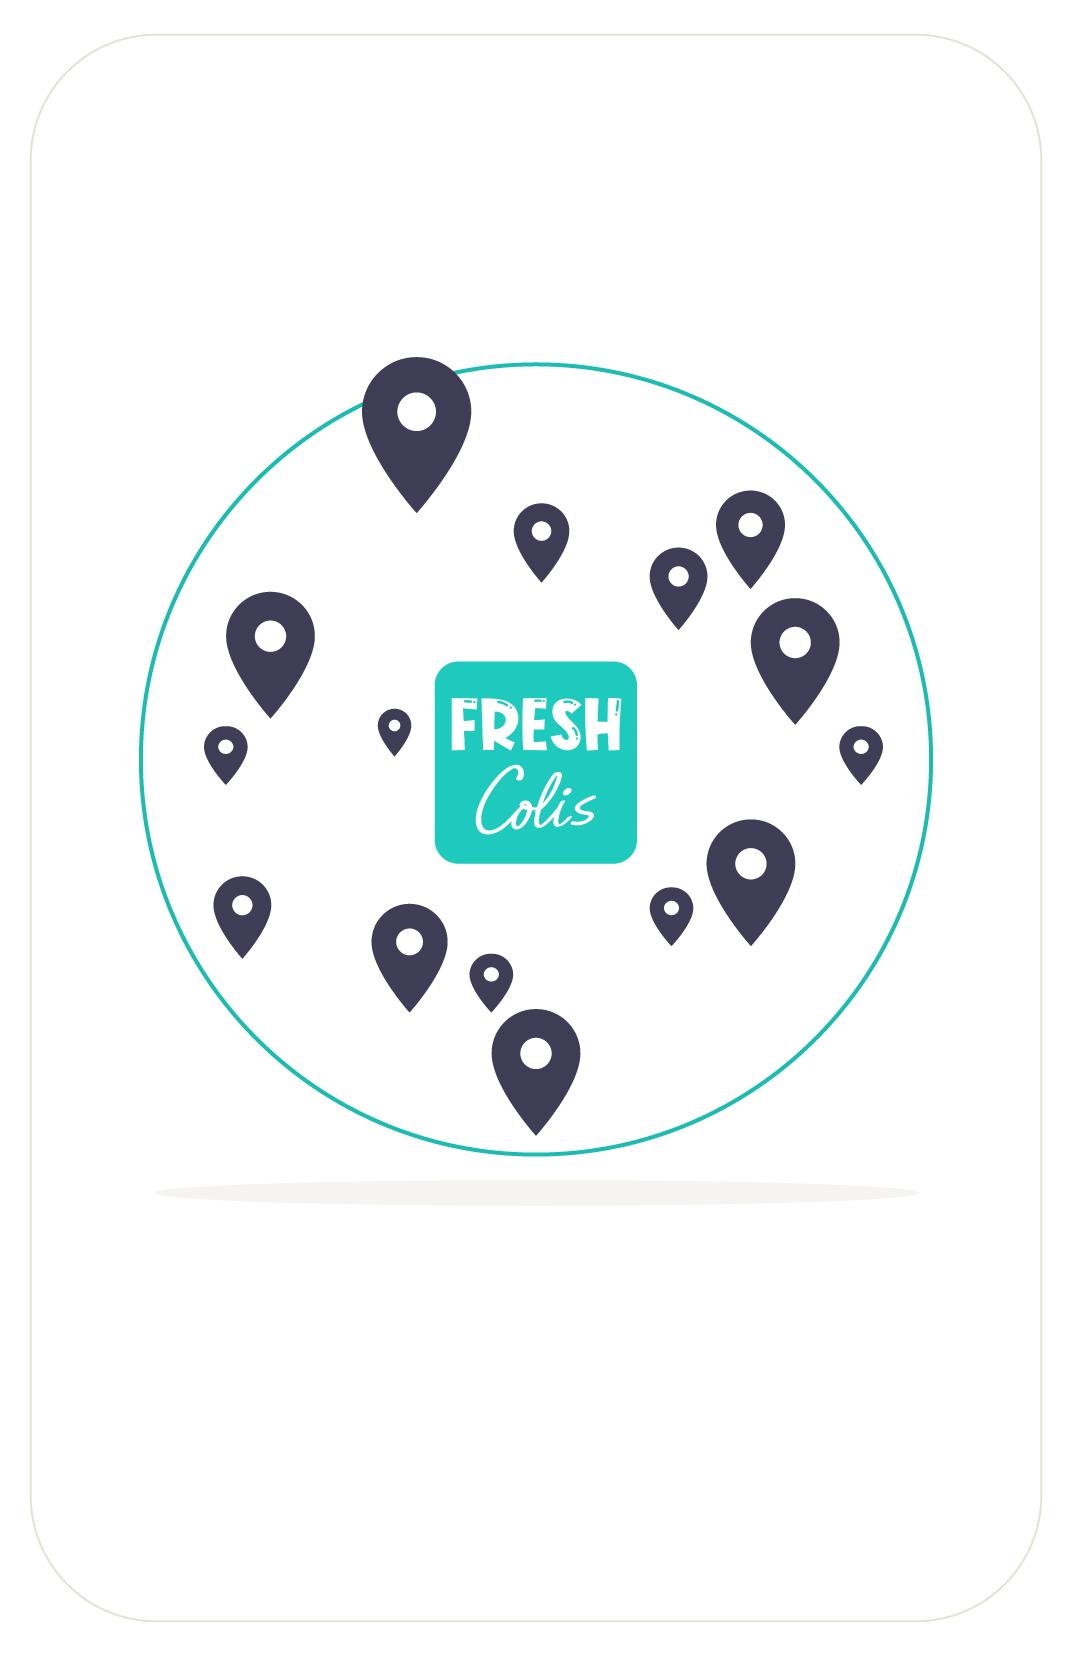 fresh-colis-network